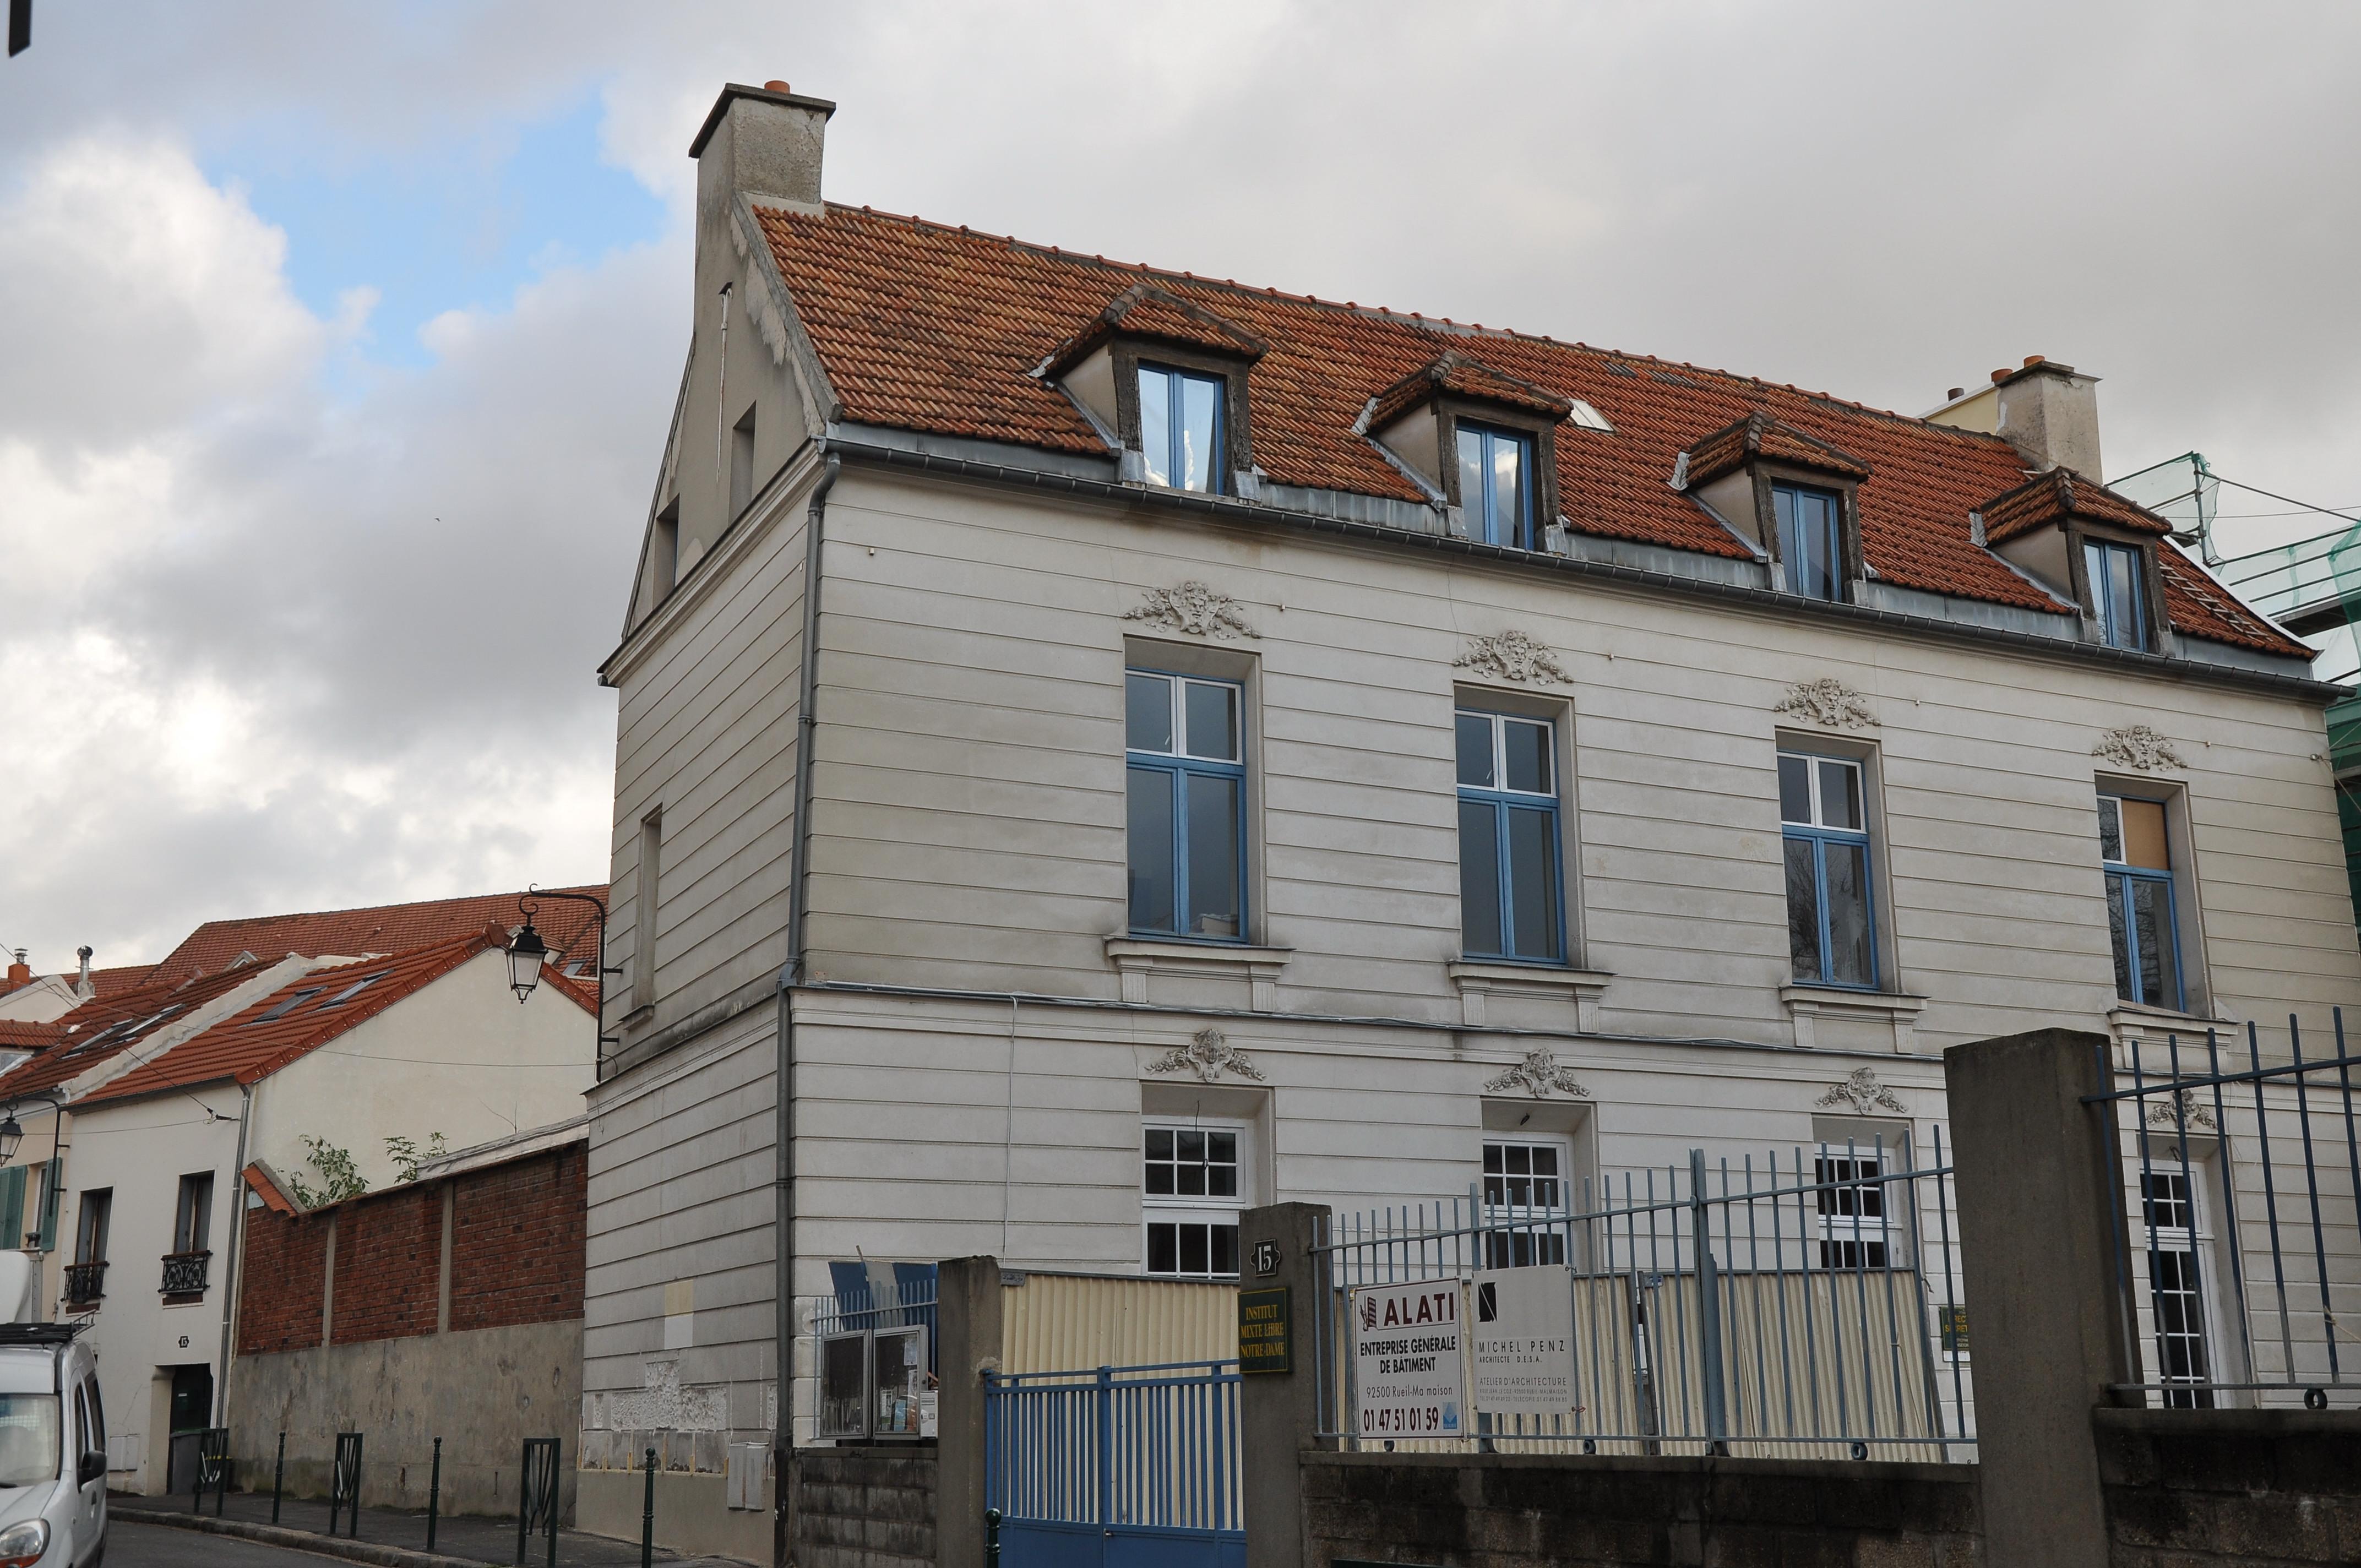 File Rueil Malmaison Maison Dite Pavillon De La Valliere 001 Jpg Wikimedia Commons